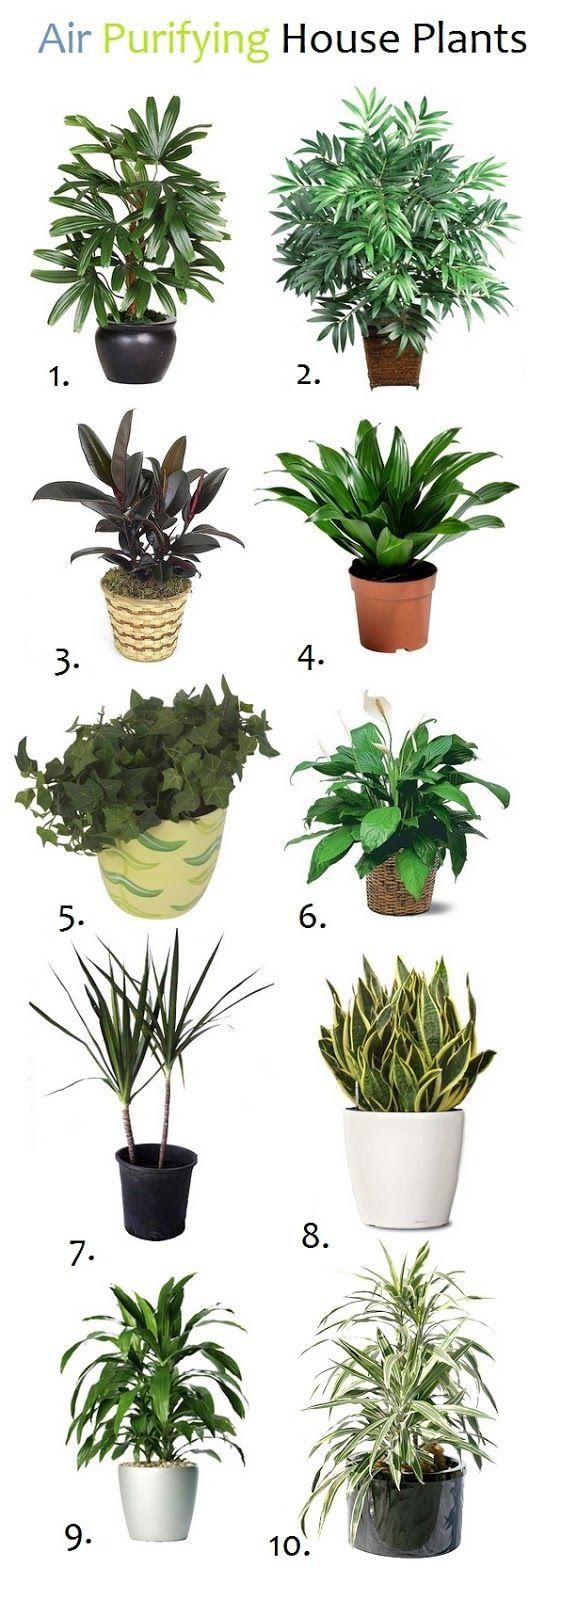 Air Purifying House Plants House Stuff Pinterest